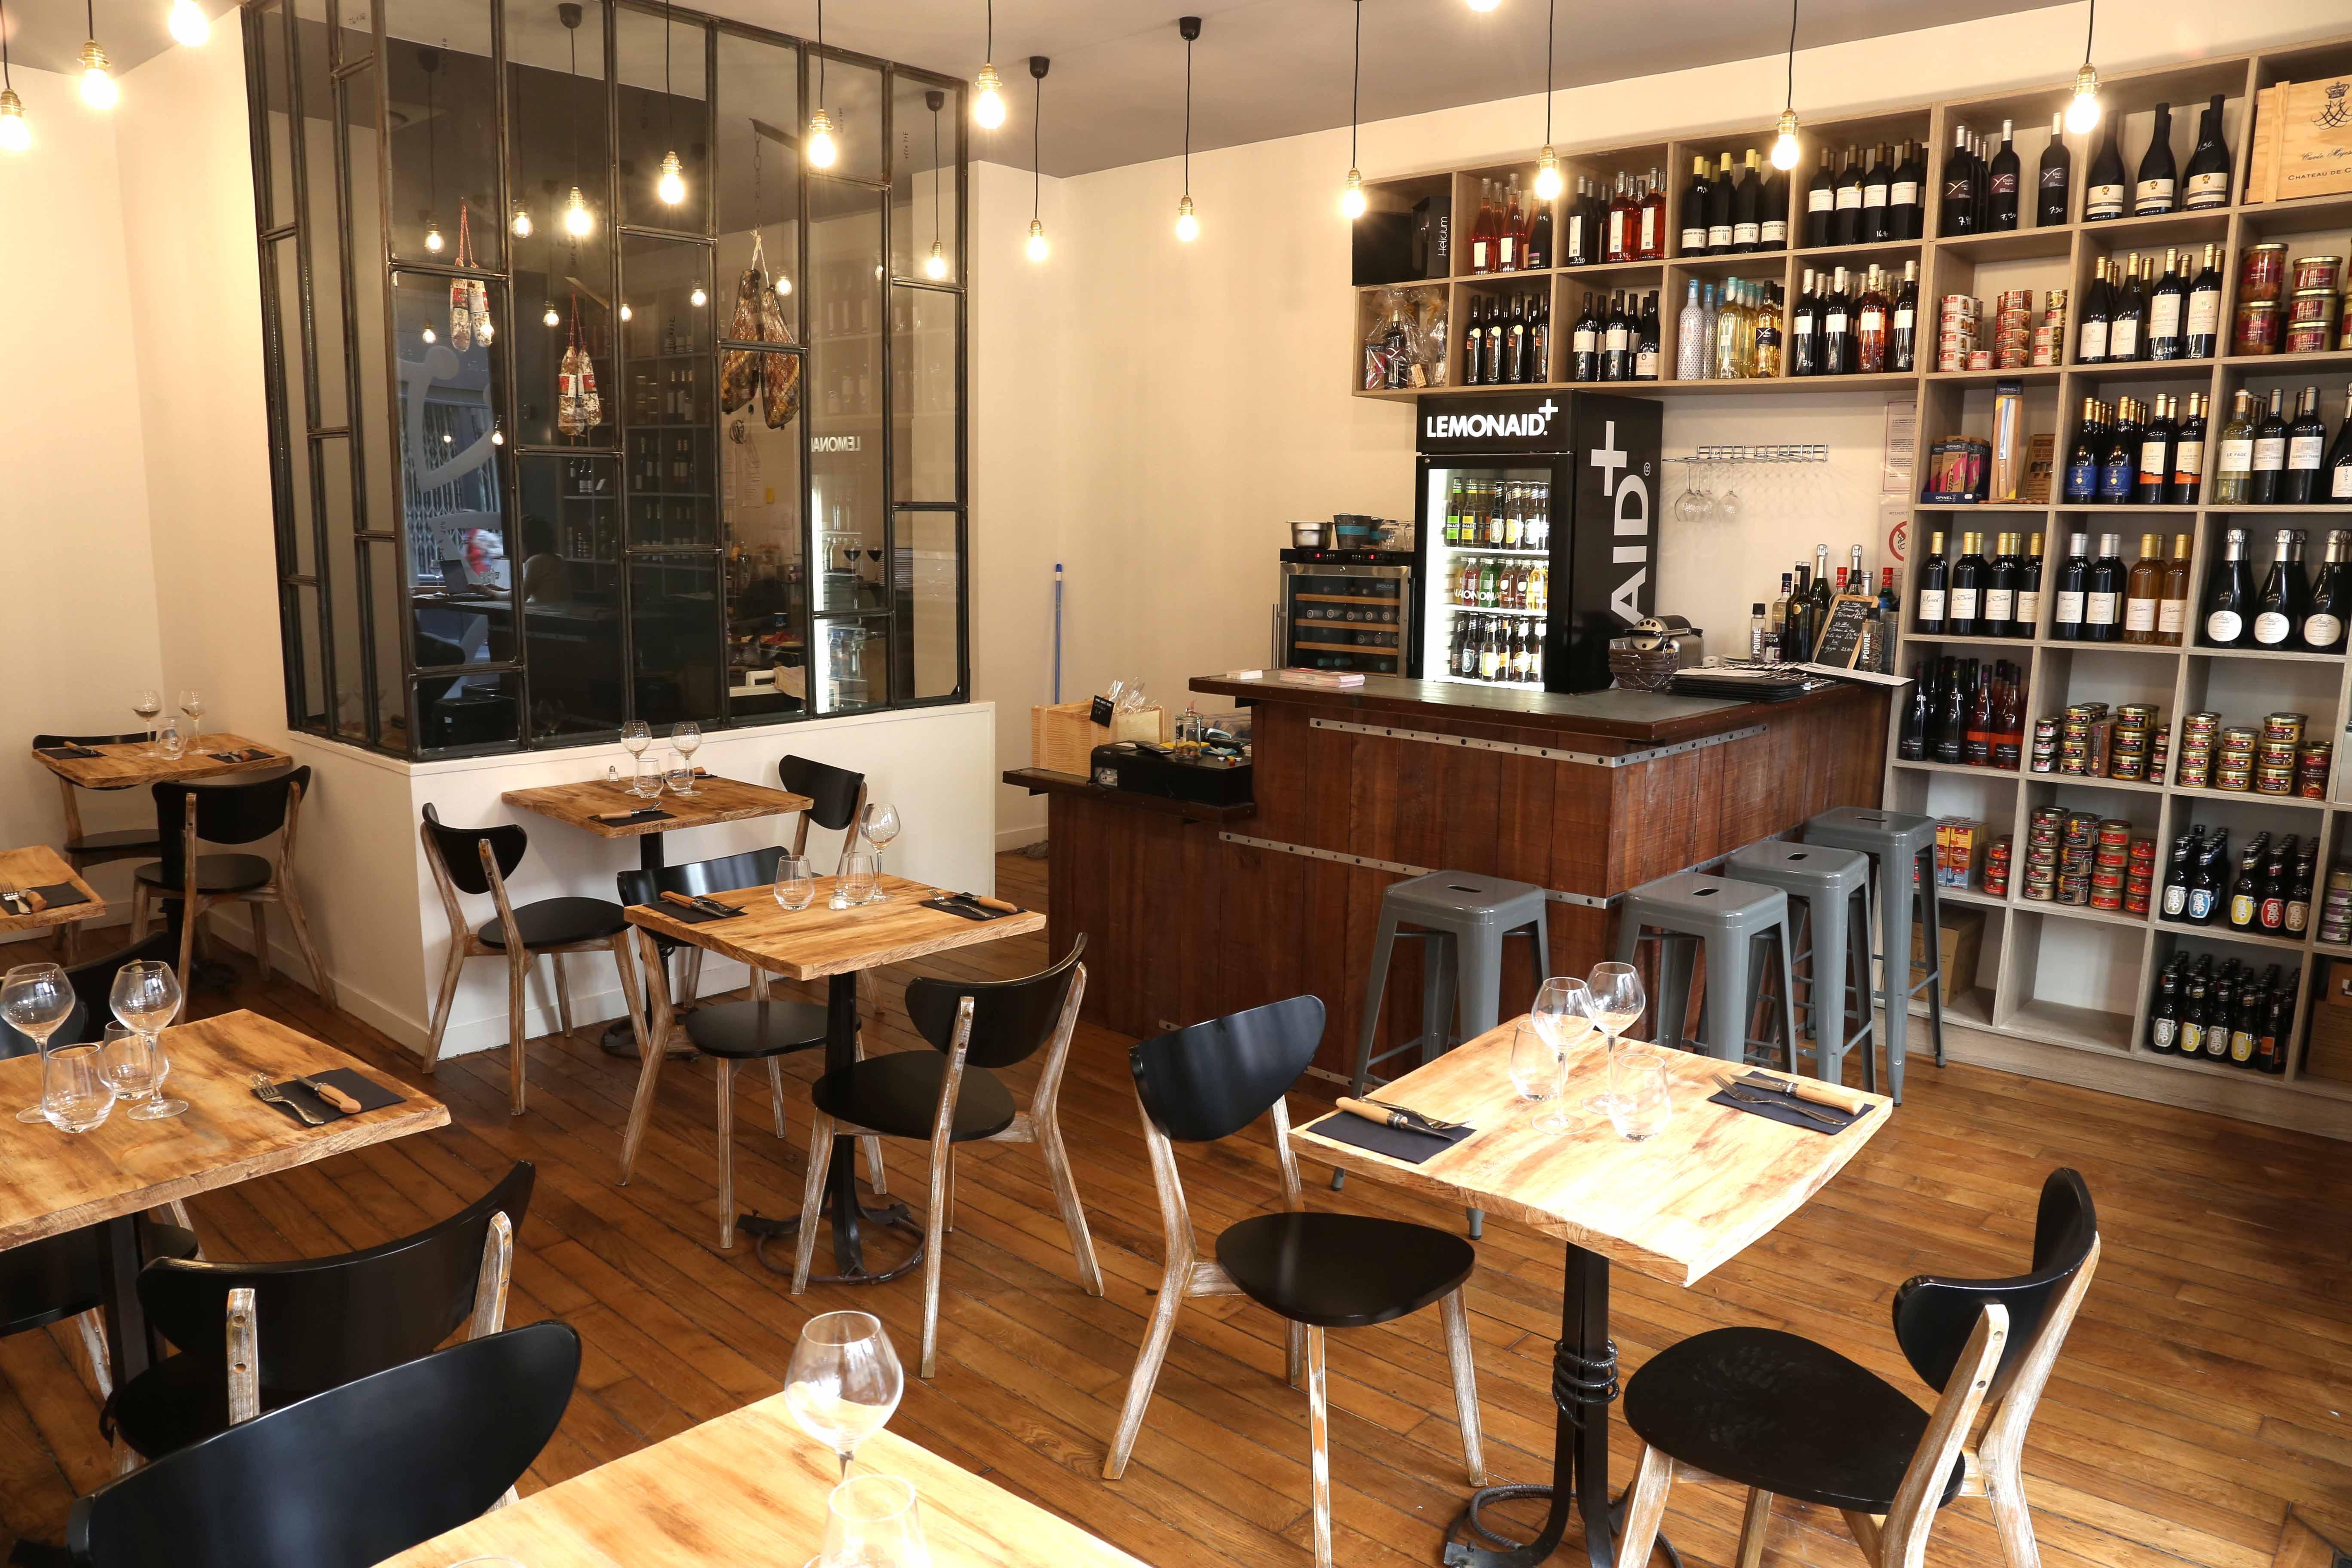 Les meilleurs bars vin o trinquer paris - Comptoir gourmand toulouse ...